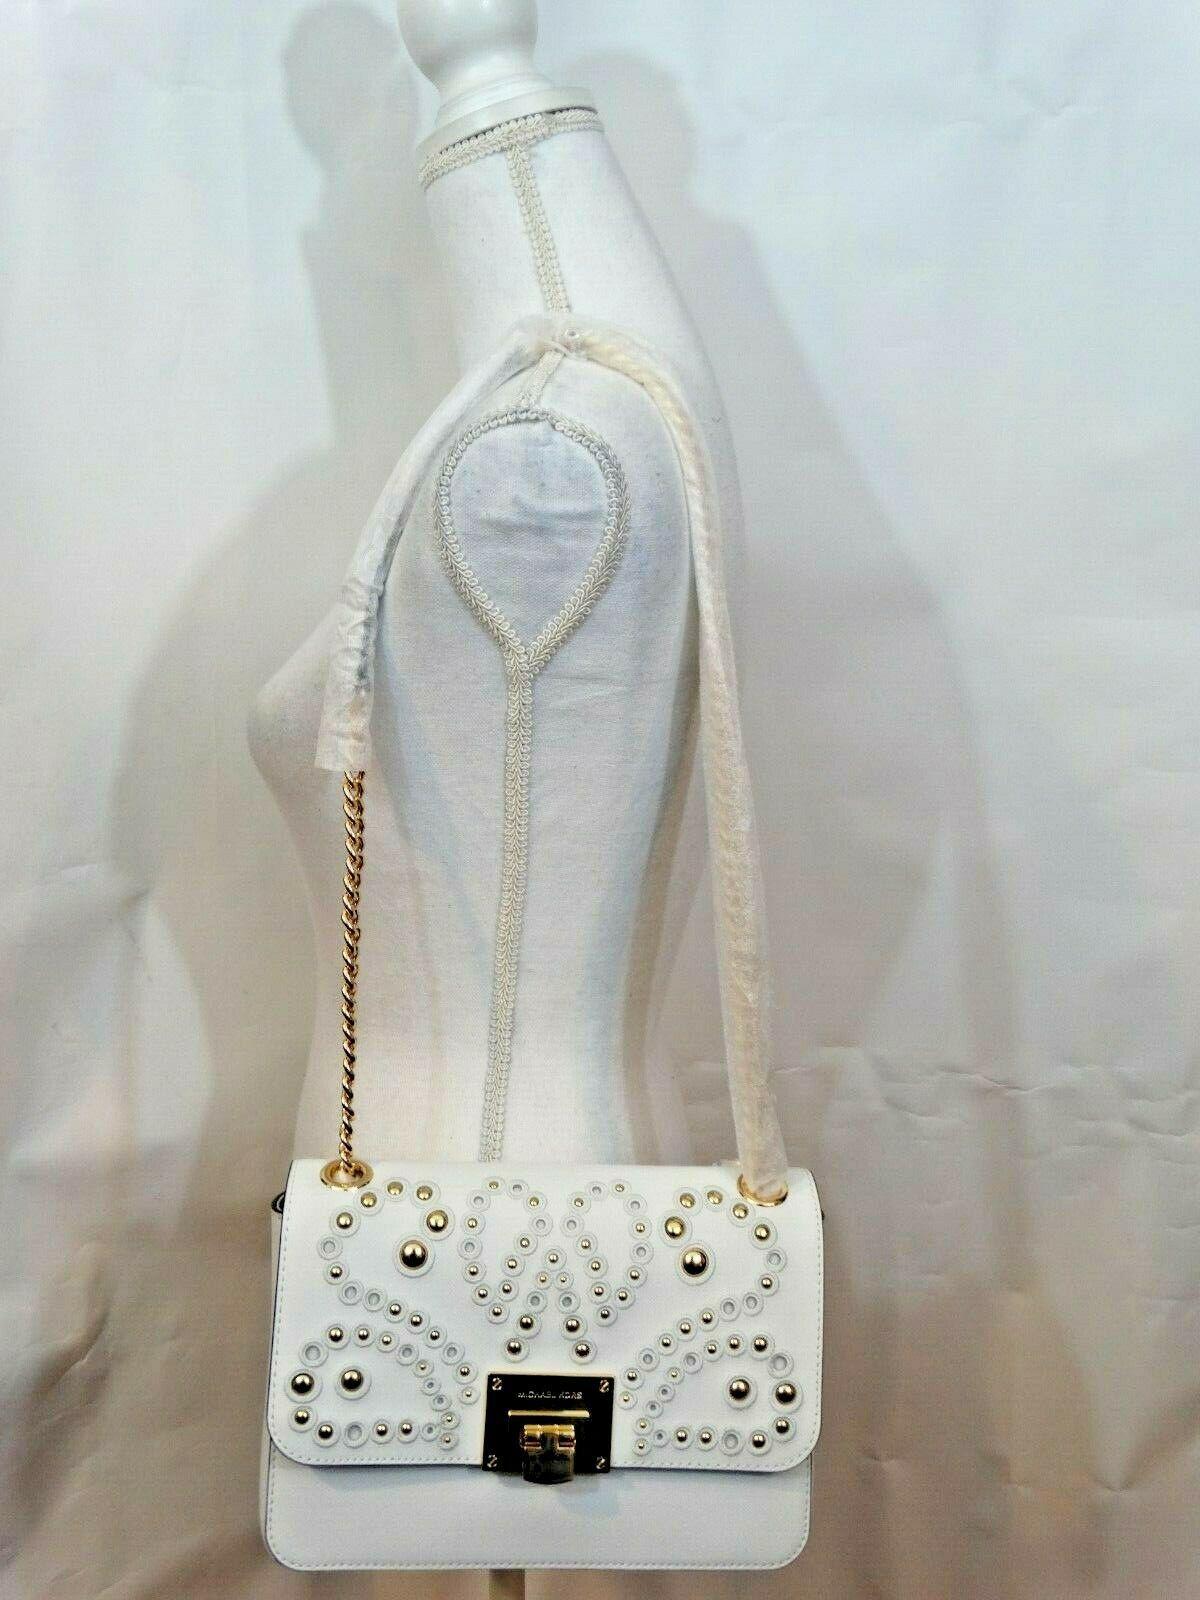 5648269c91f8 Michael Kors Tina Optic White Gold Stud Shoulder Bag (Retail 398) New With  Tag